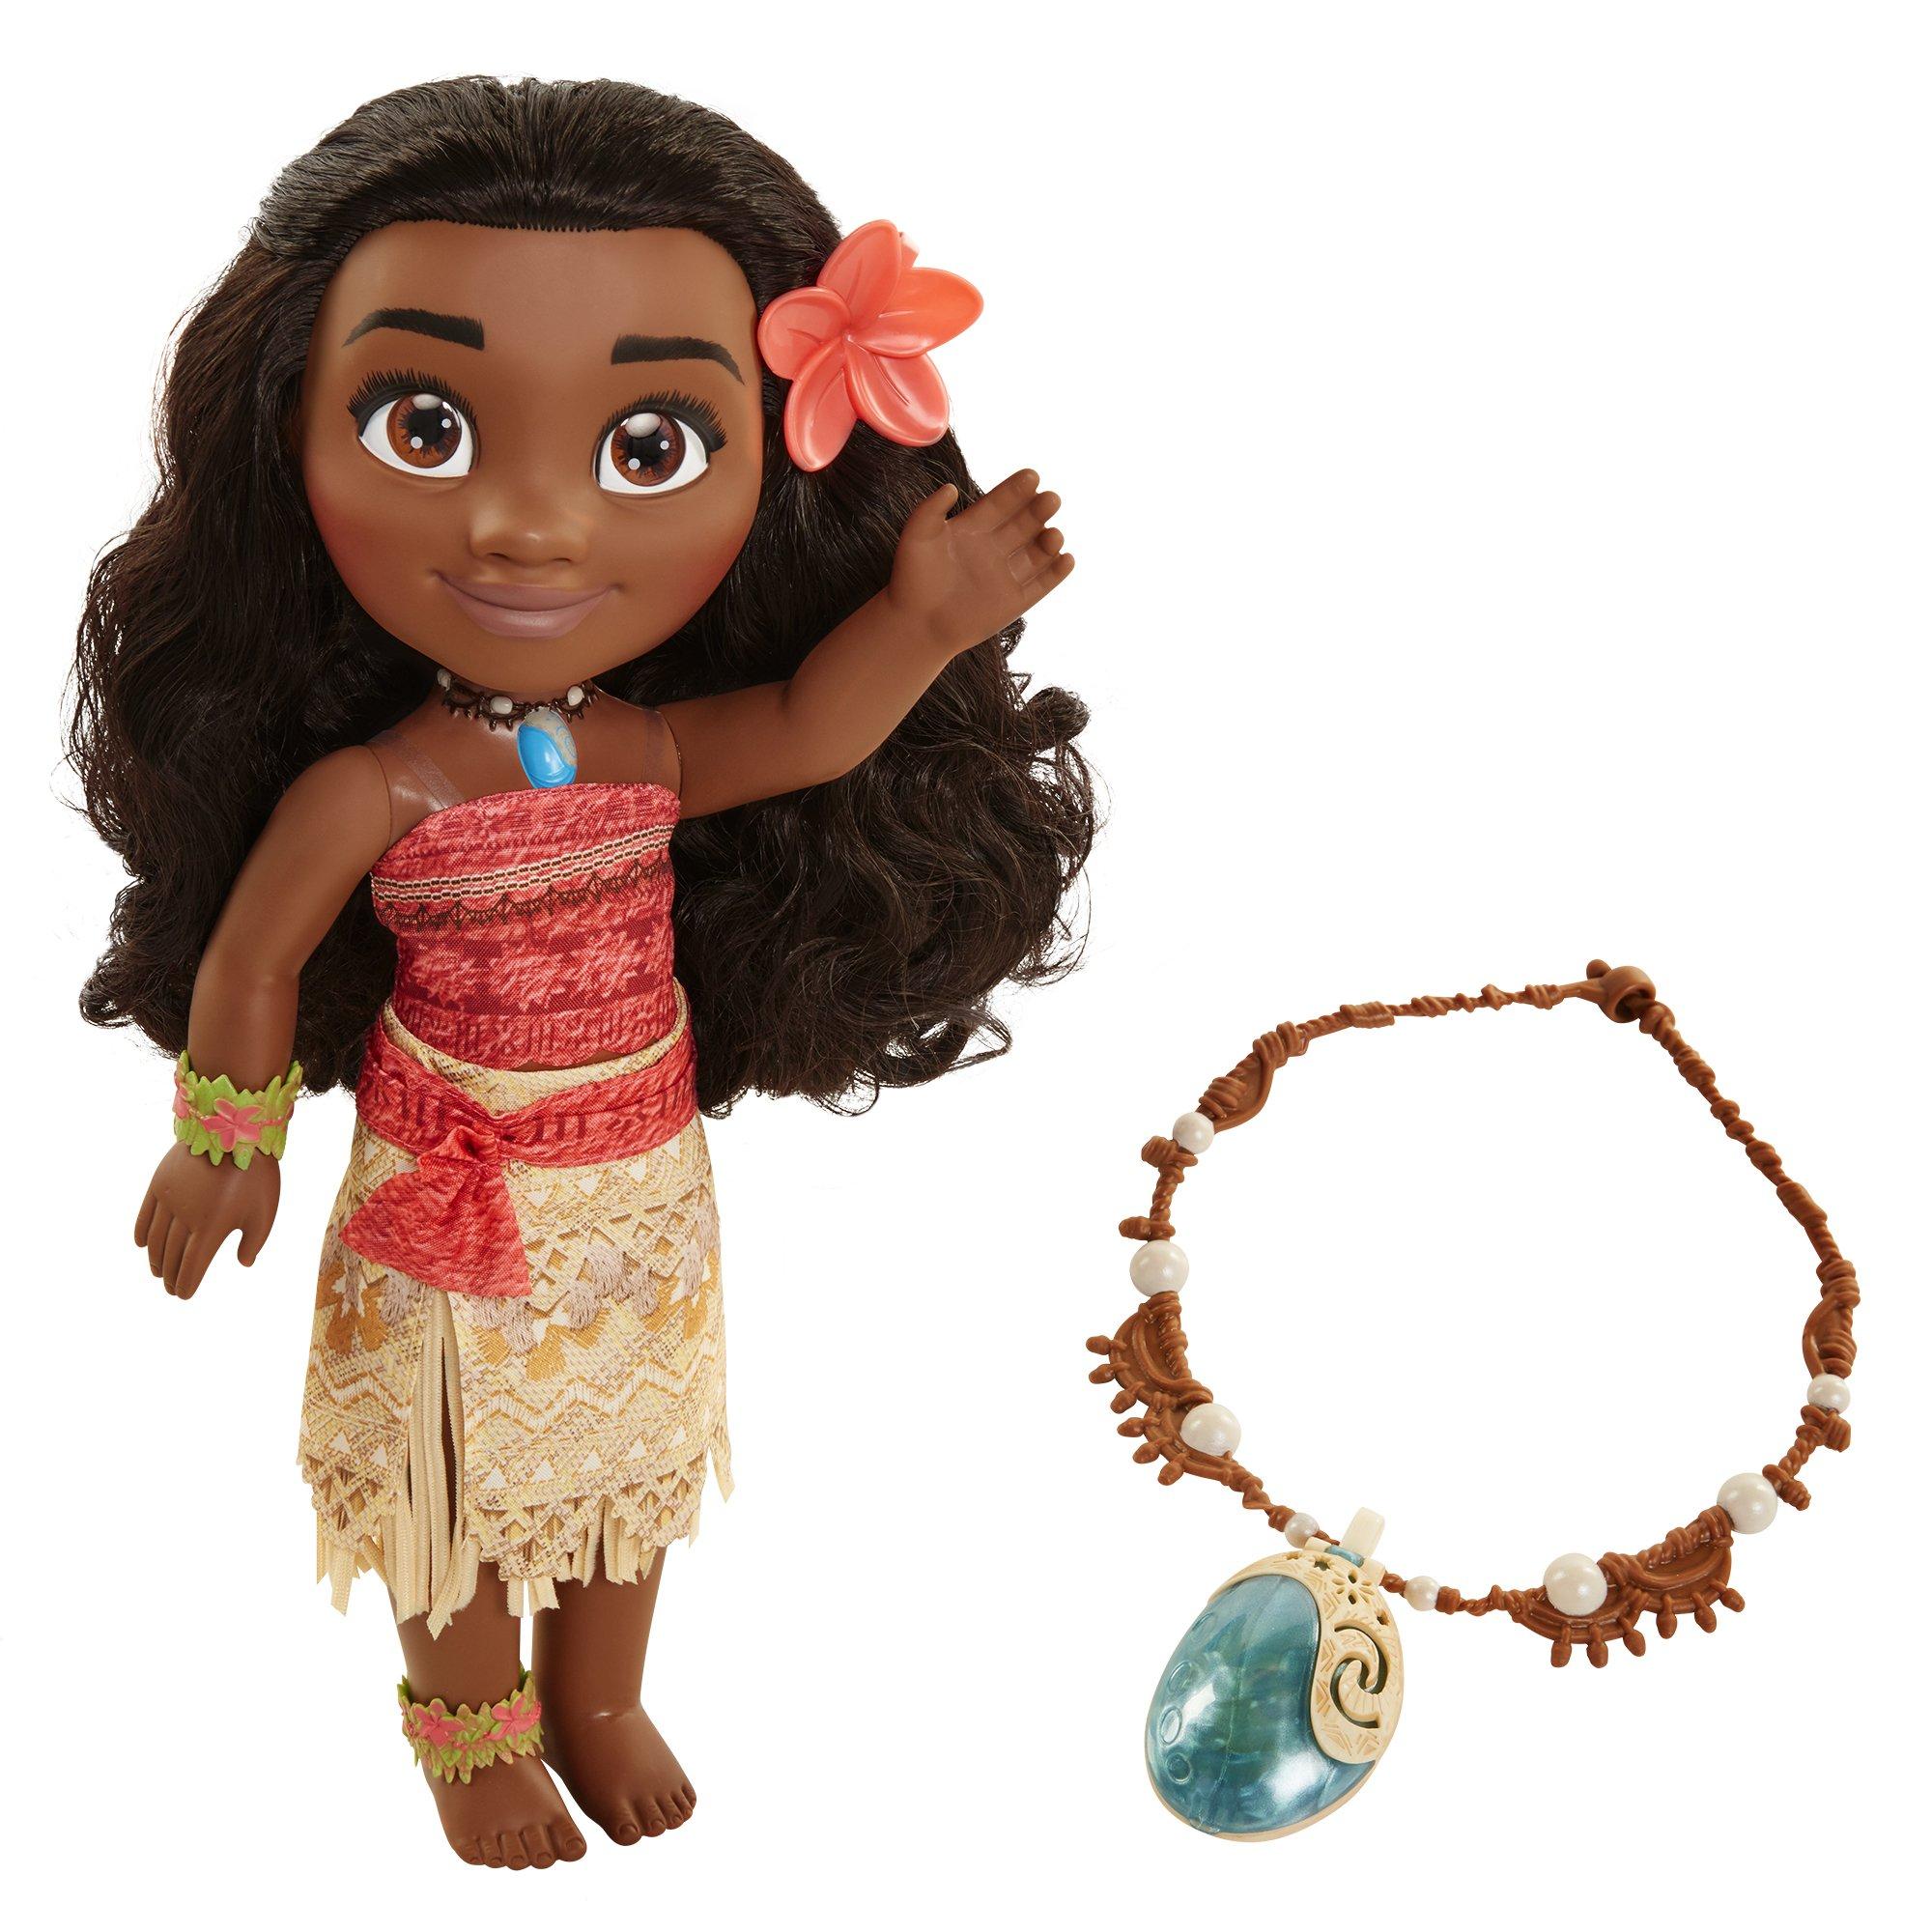 Disney Moana Adventure With Magical Seashell Necklace Doll by Moana